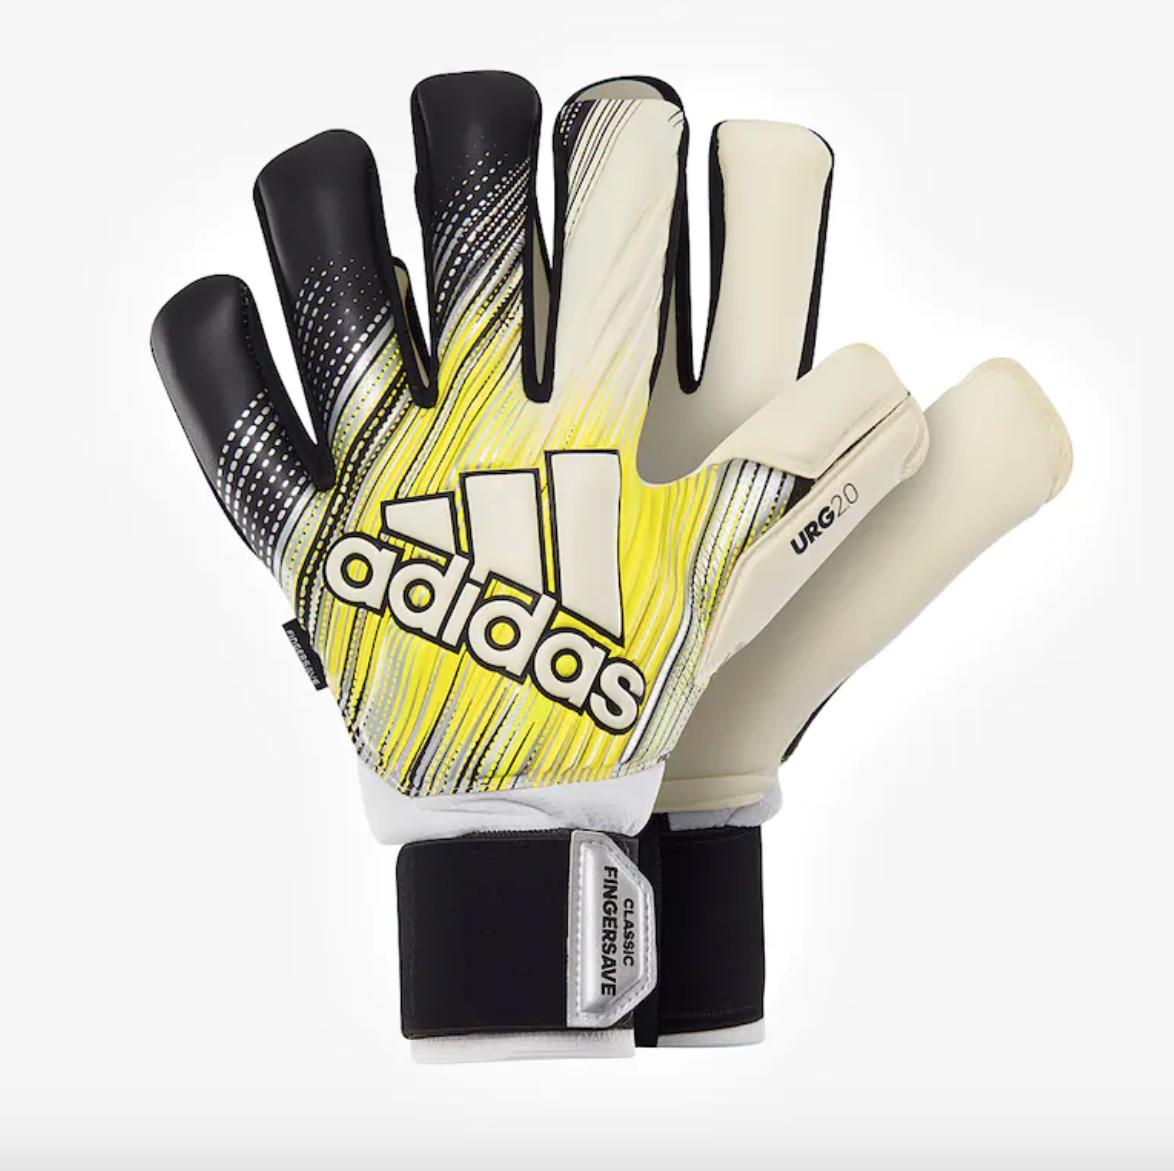 iker-casillas-ligue-des-champions-2000-gants-adidas-4